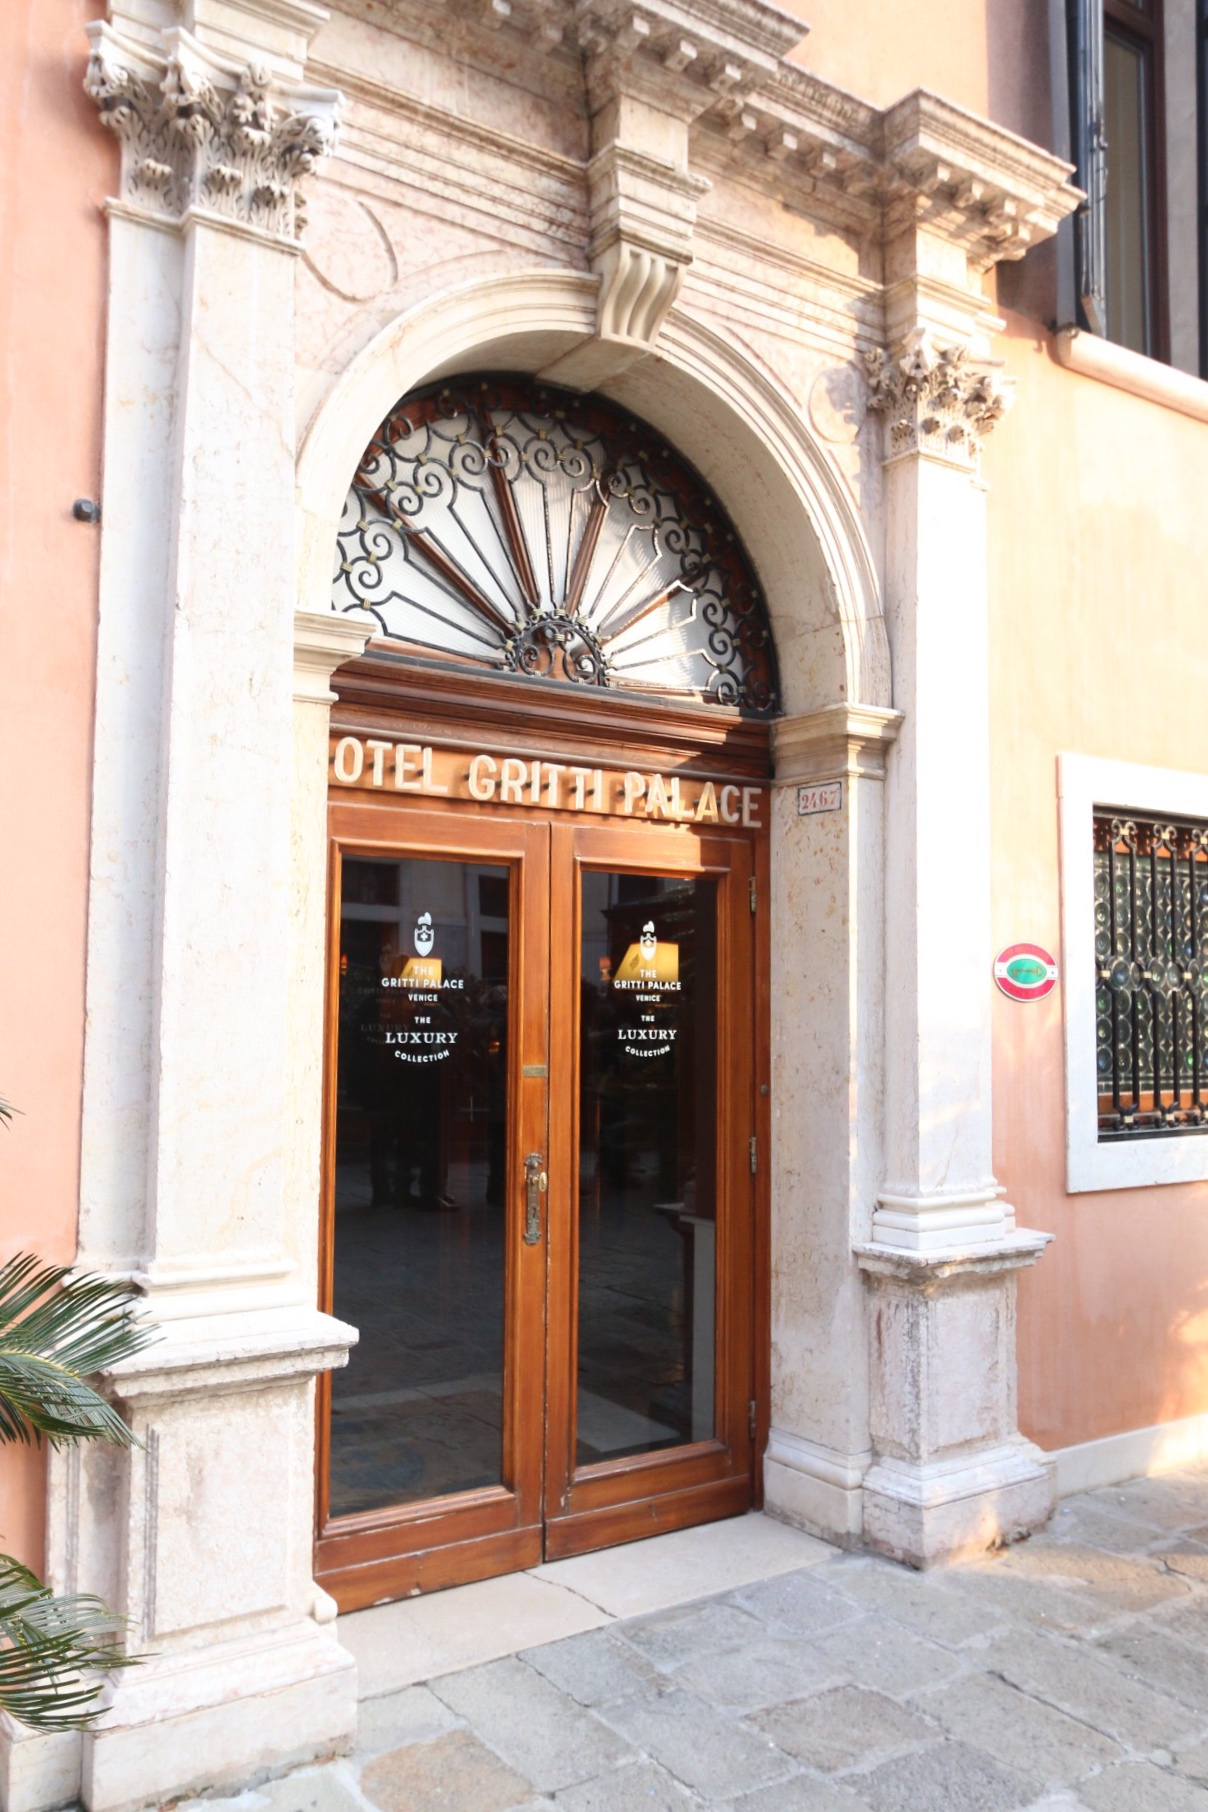 hotelgritti14